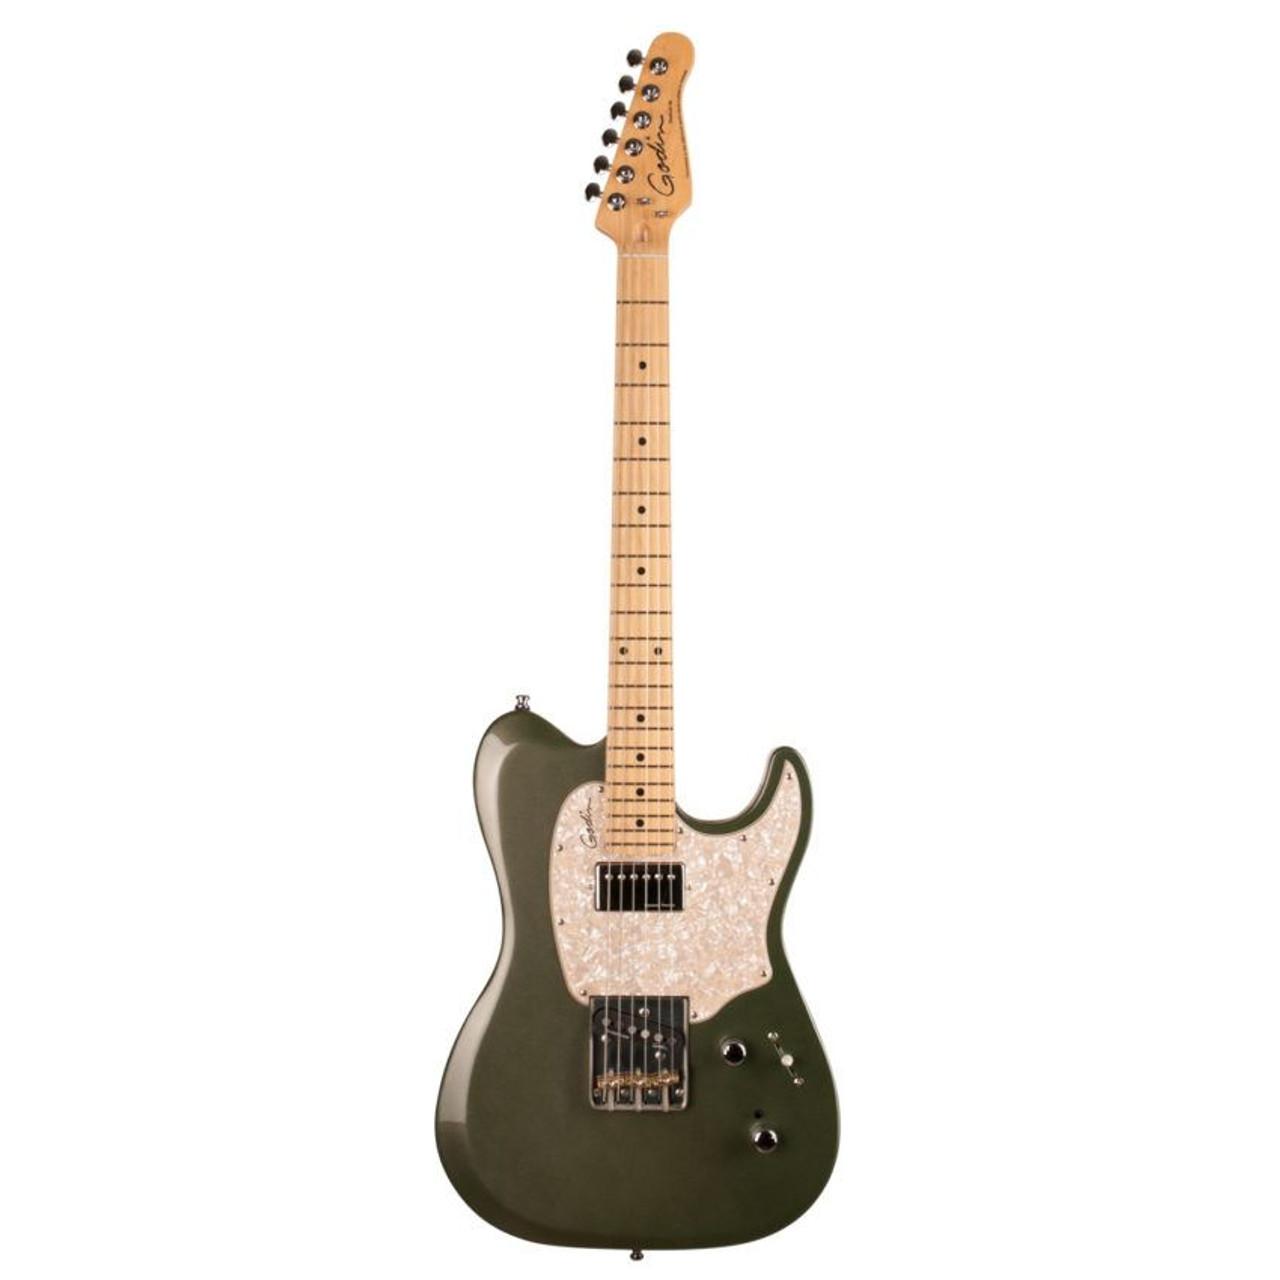 37292 Godin Electric Guitar Stand